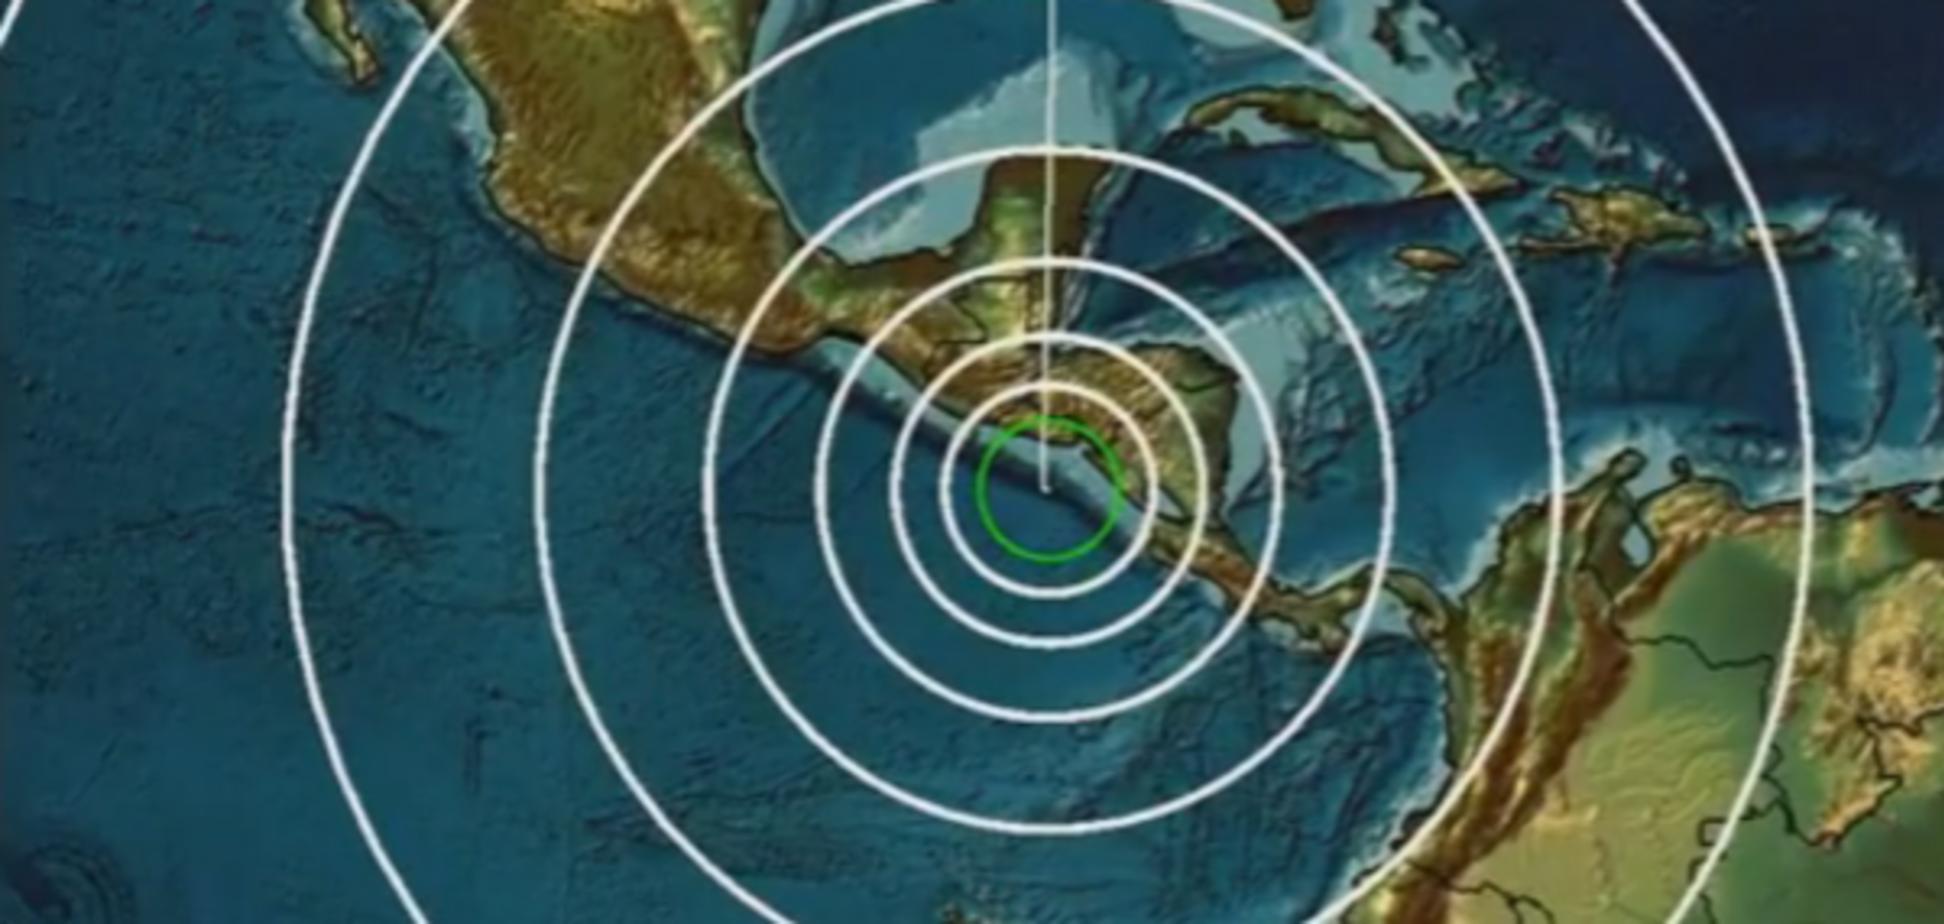 Землетрясение в Сальвадоре